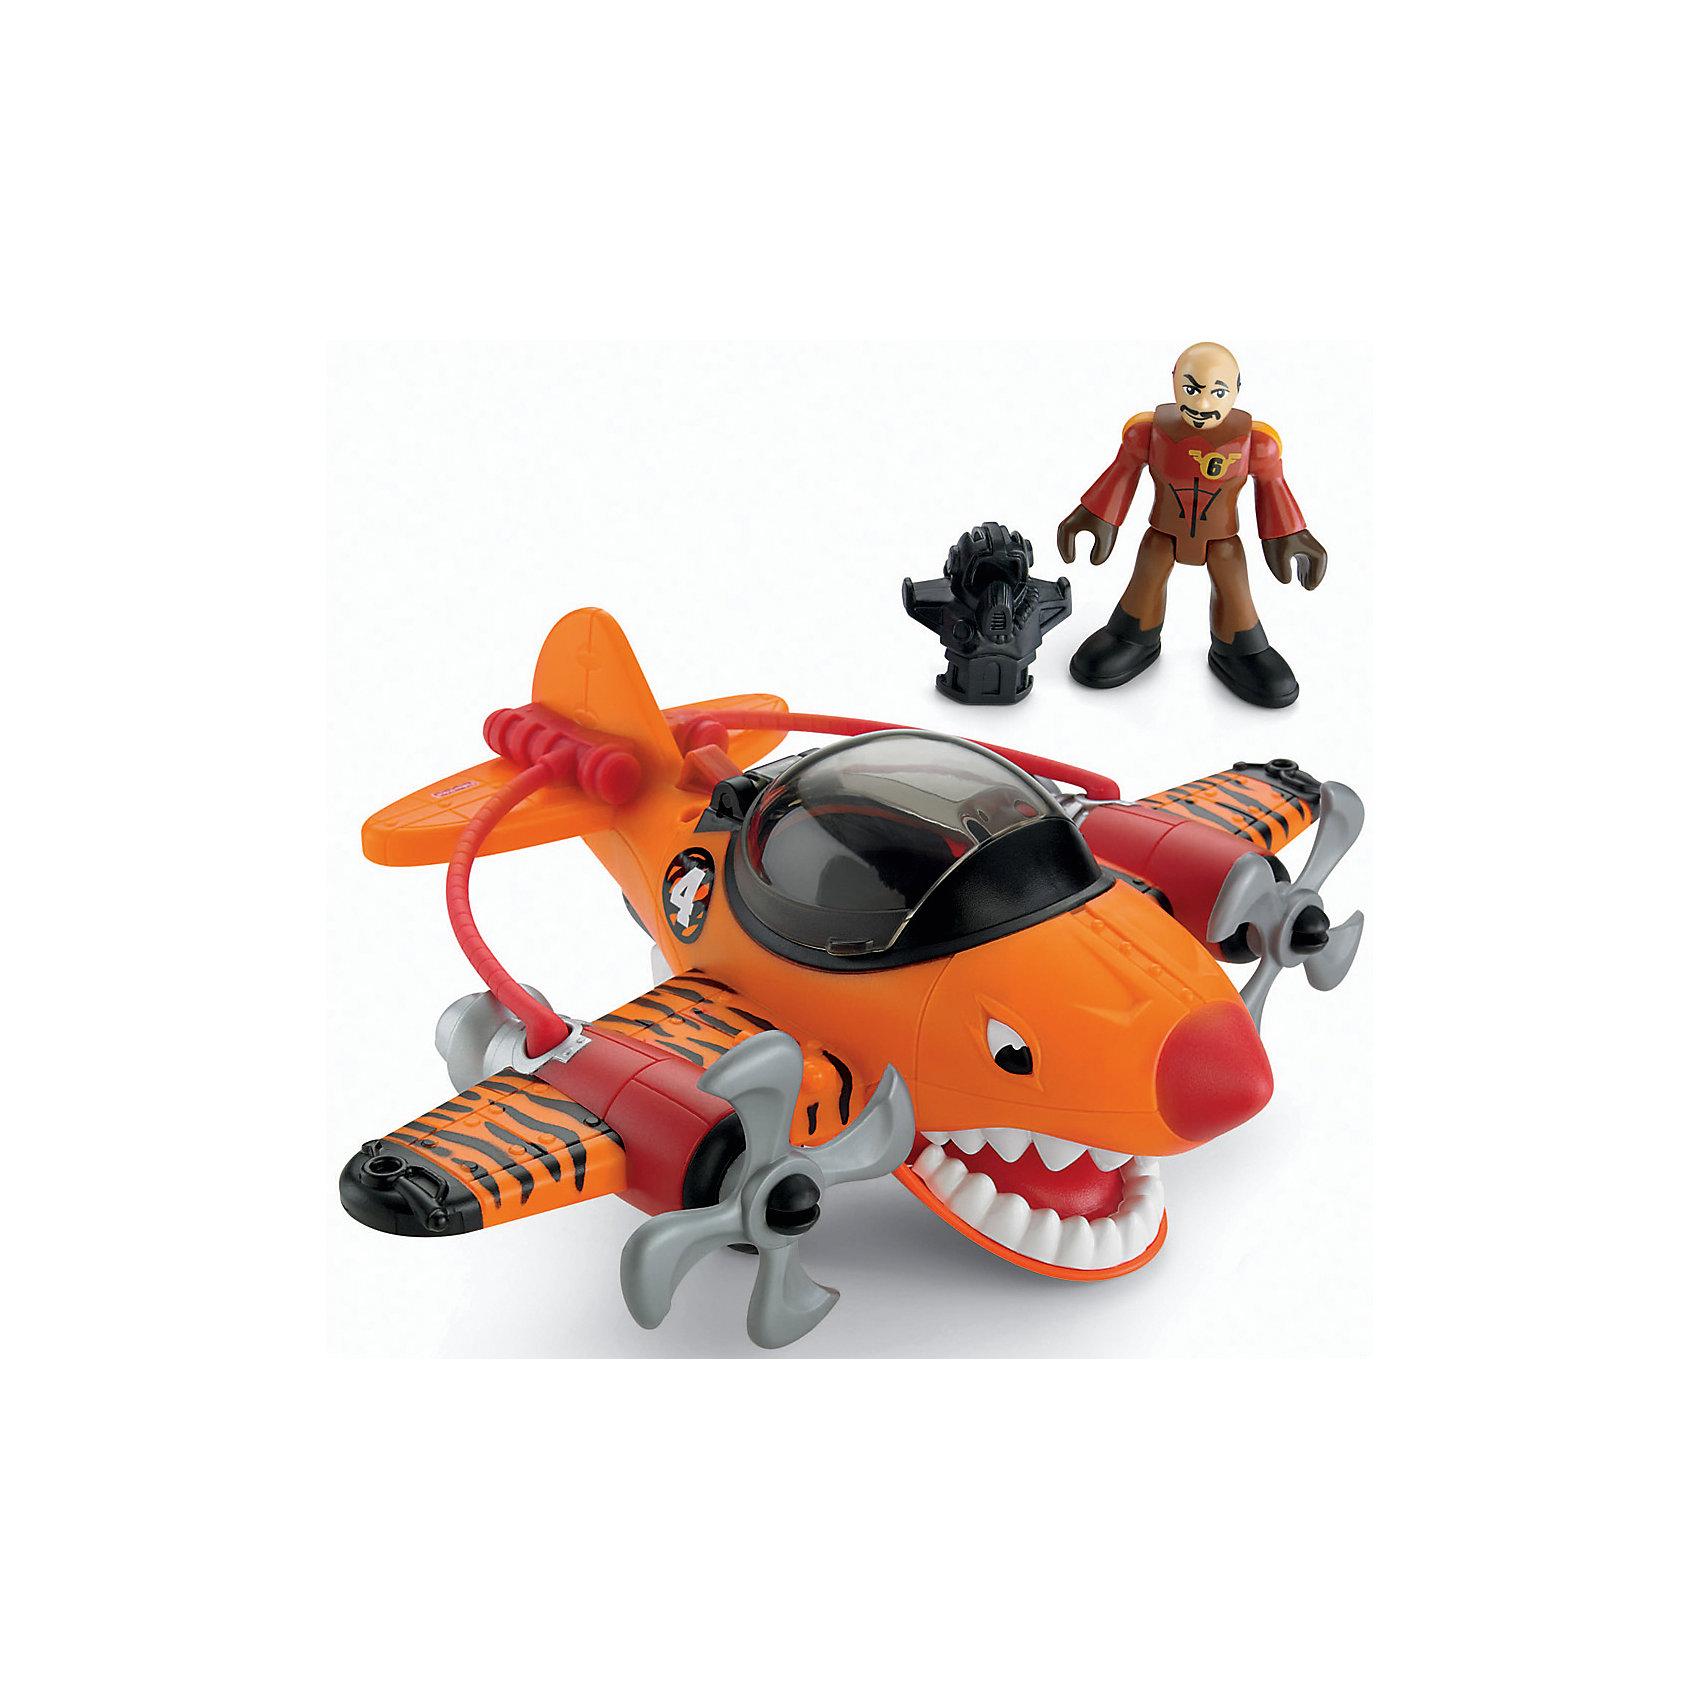 Mattel Летательный аппарат Тигровая акула, Imaginext, Fisher Price mattel базовая фигурка октонавты fisher price